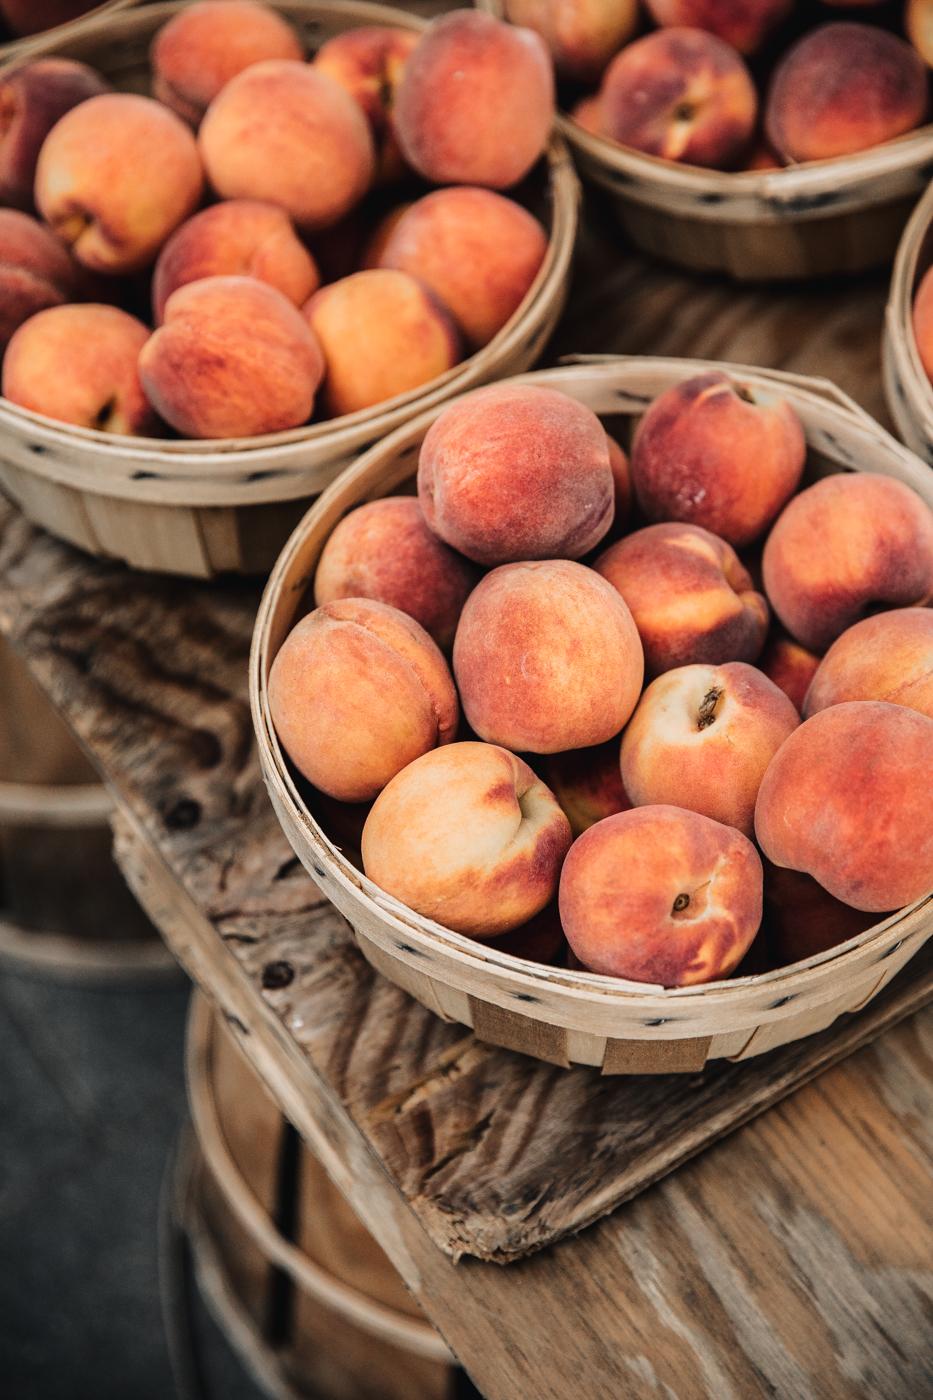 lexington kentucky, lexington farmers market, 21c lexington, 21c hotels, lockbox lexington, appalachian farmers summit